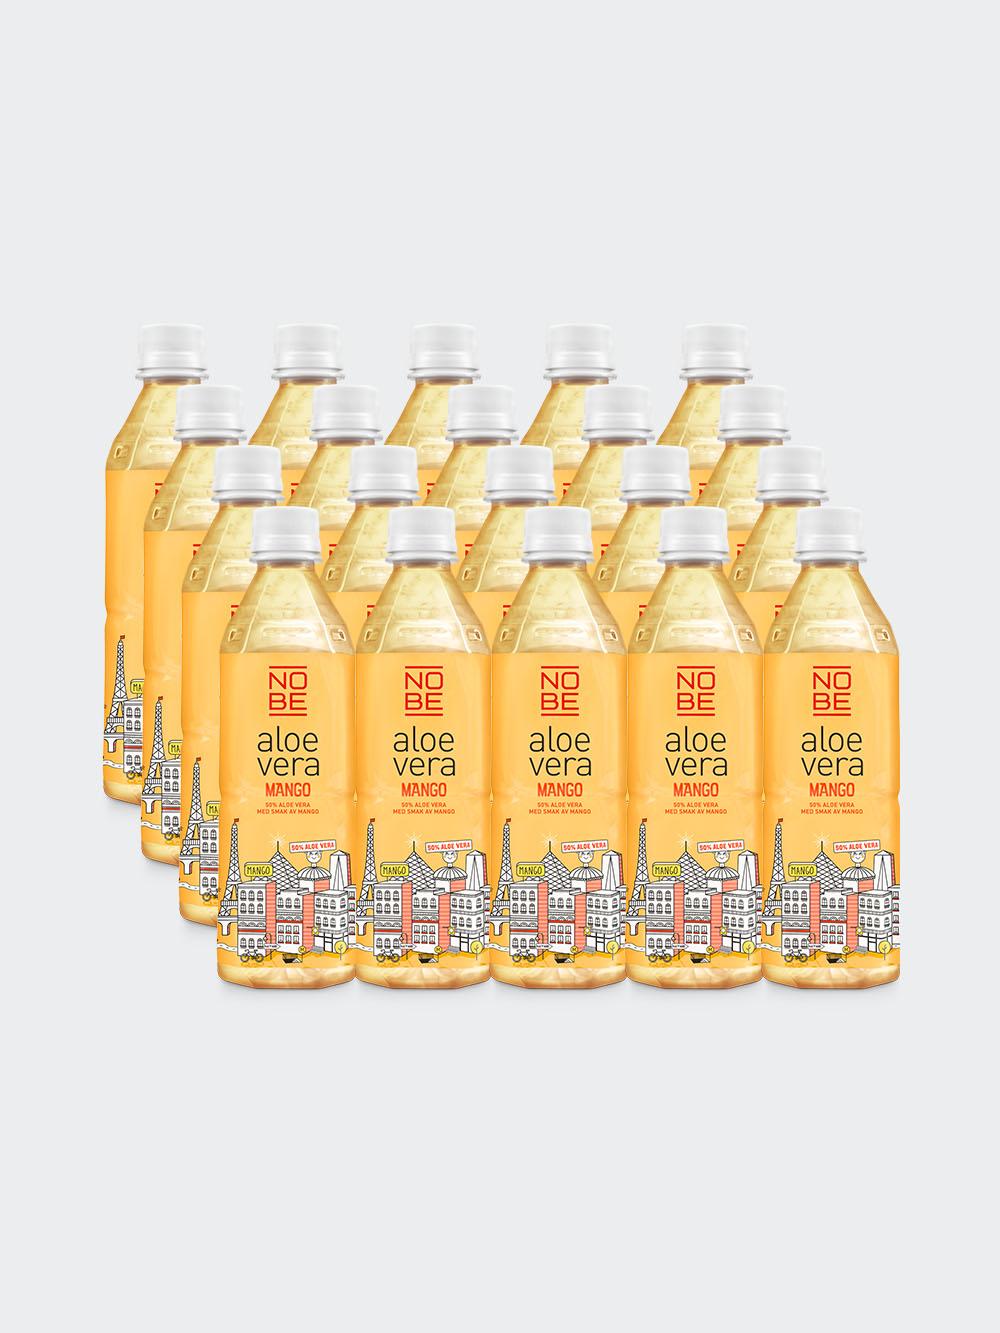 NOBE Aloe Vera – Mango 20-pack